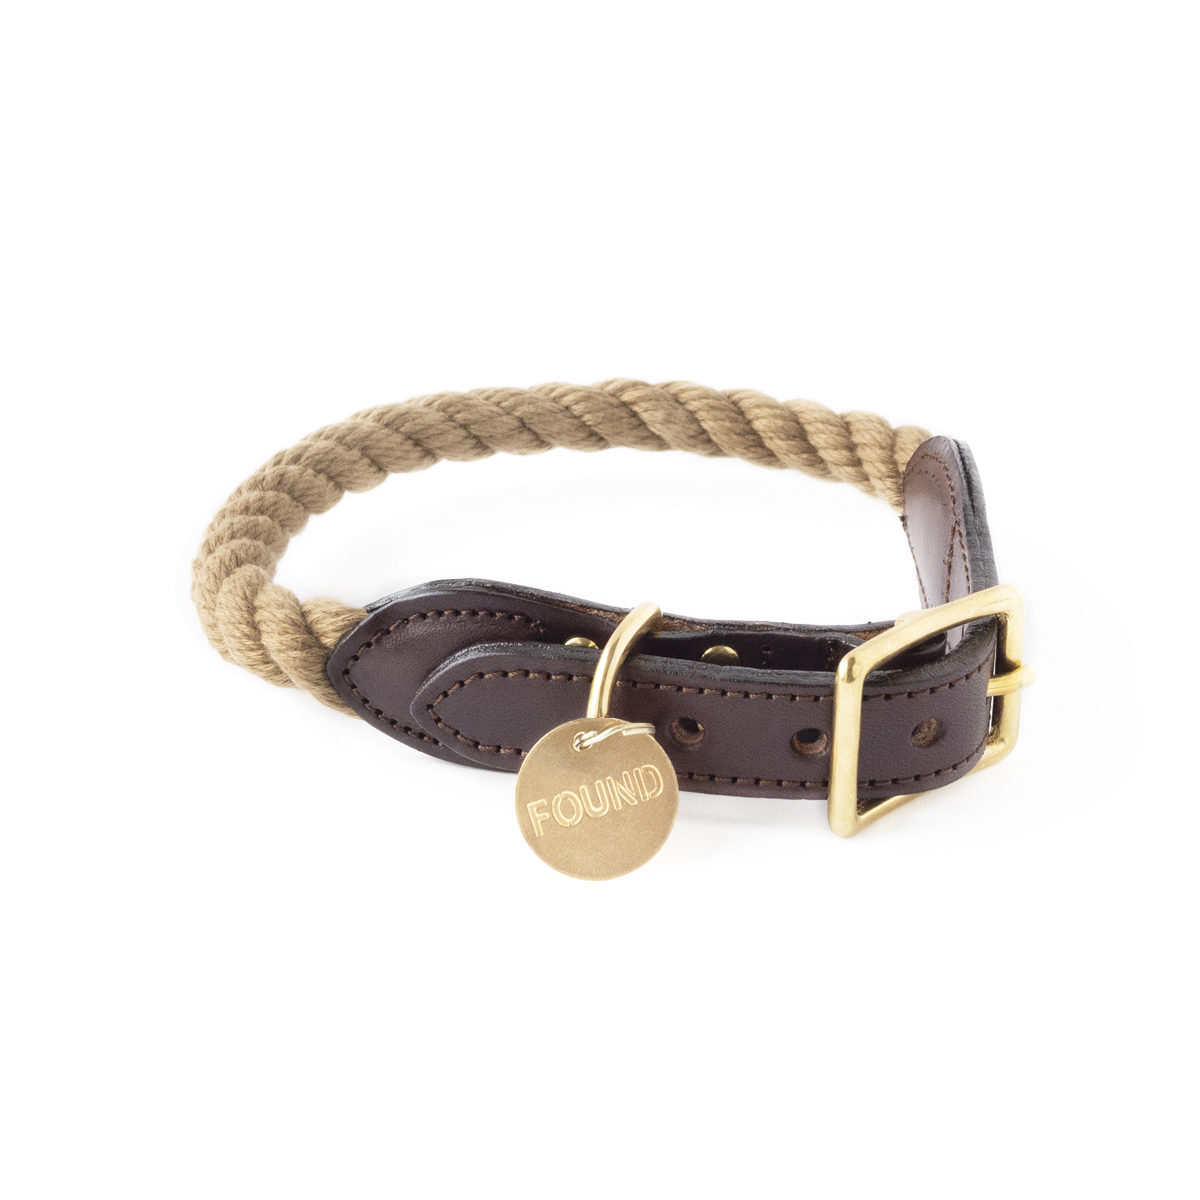 Natural rope dog collar